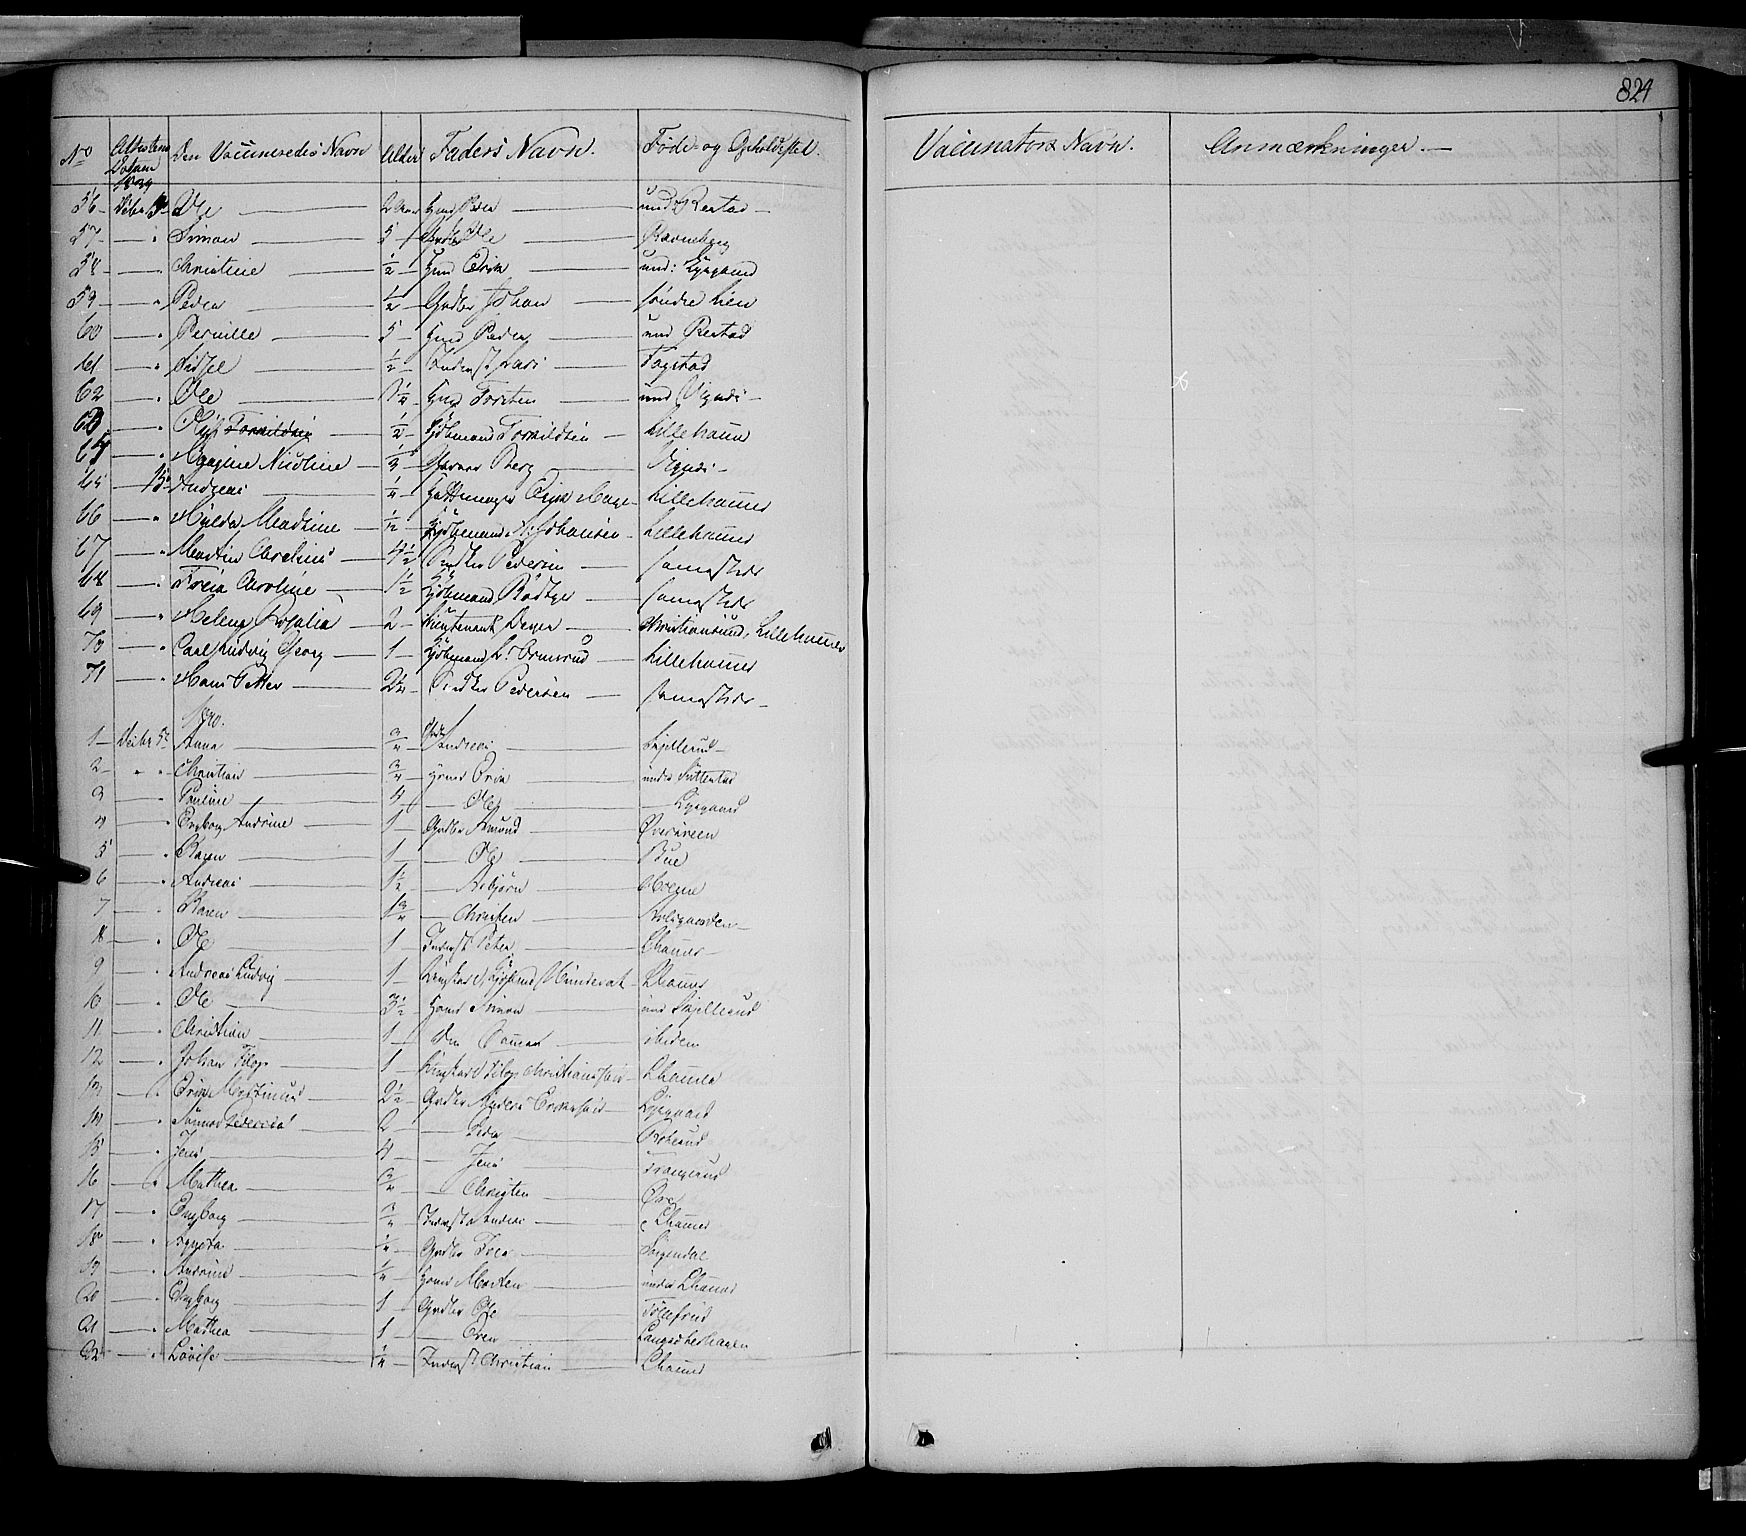 SAH, Fåberg prestekontor, Ministerialbok nr. 5, 1836-1854, s. 823-824